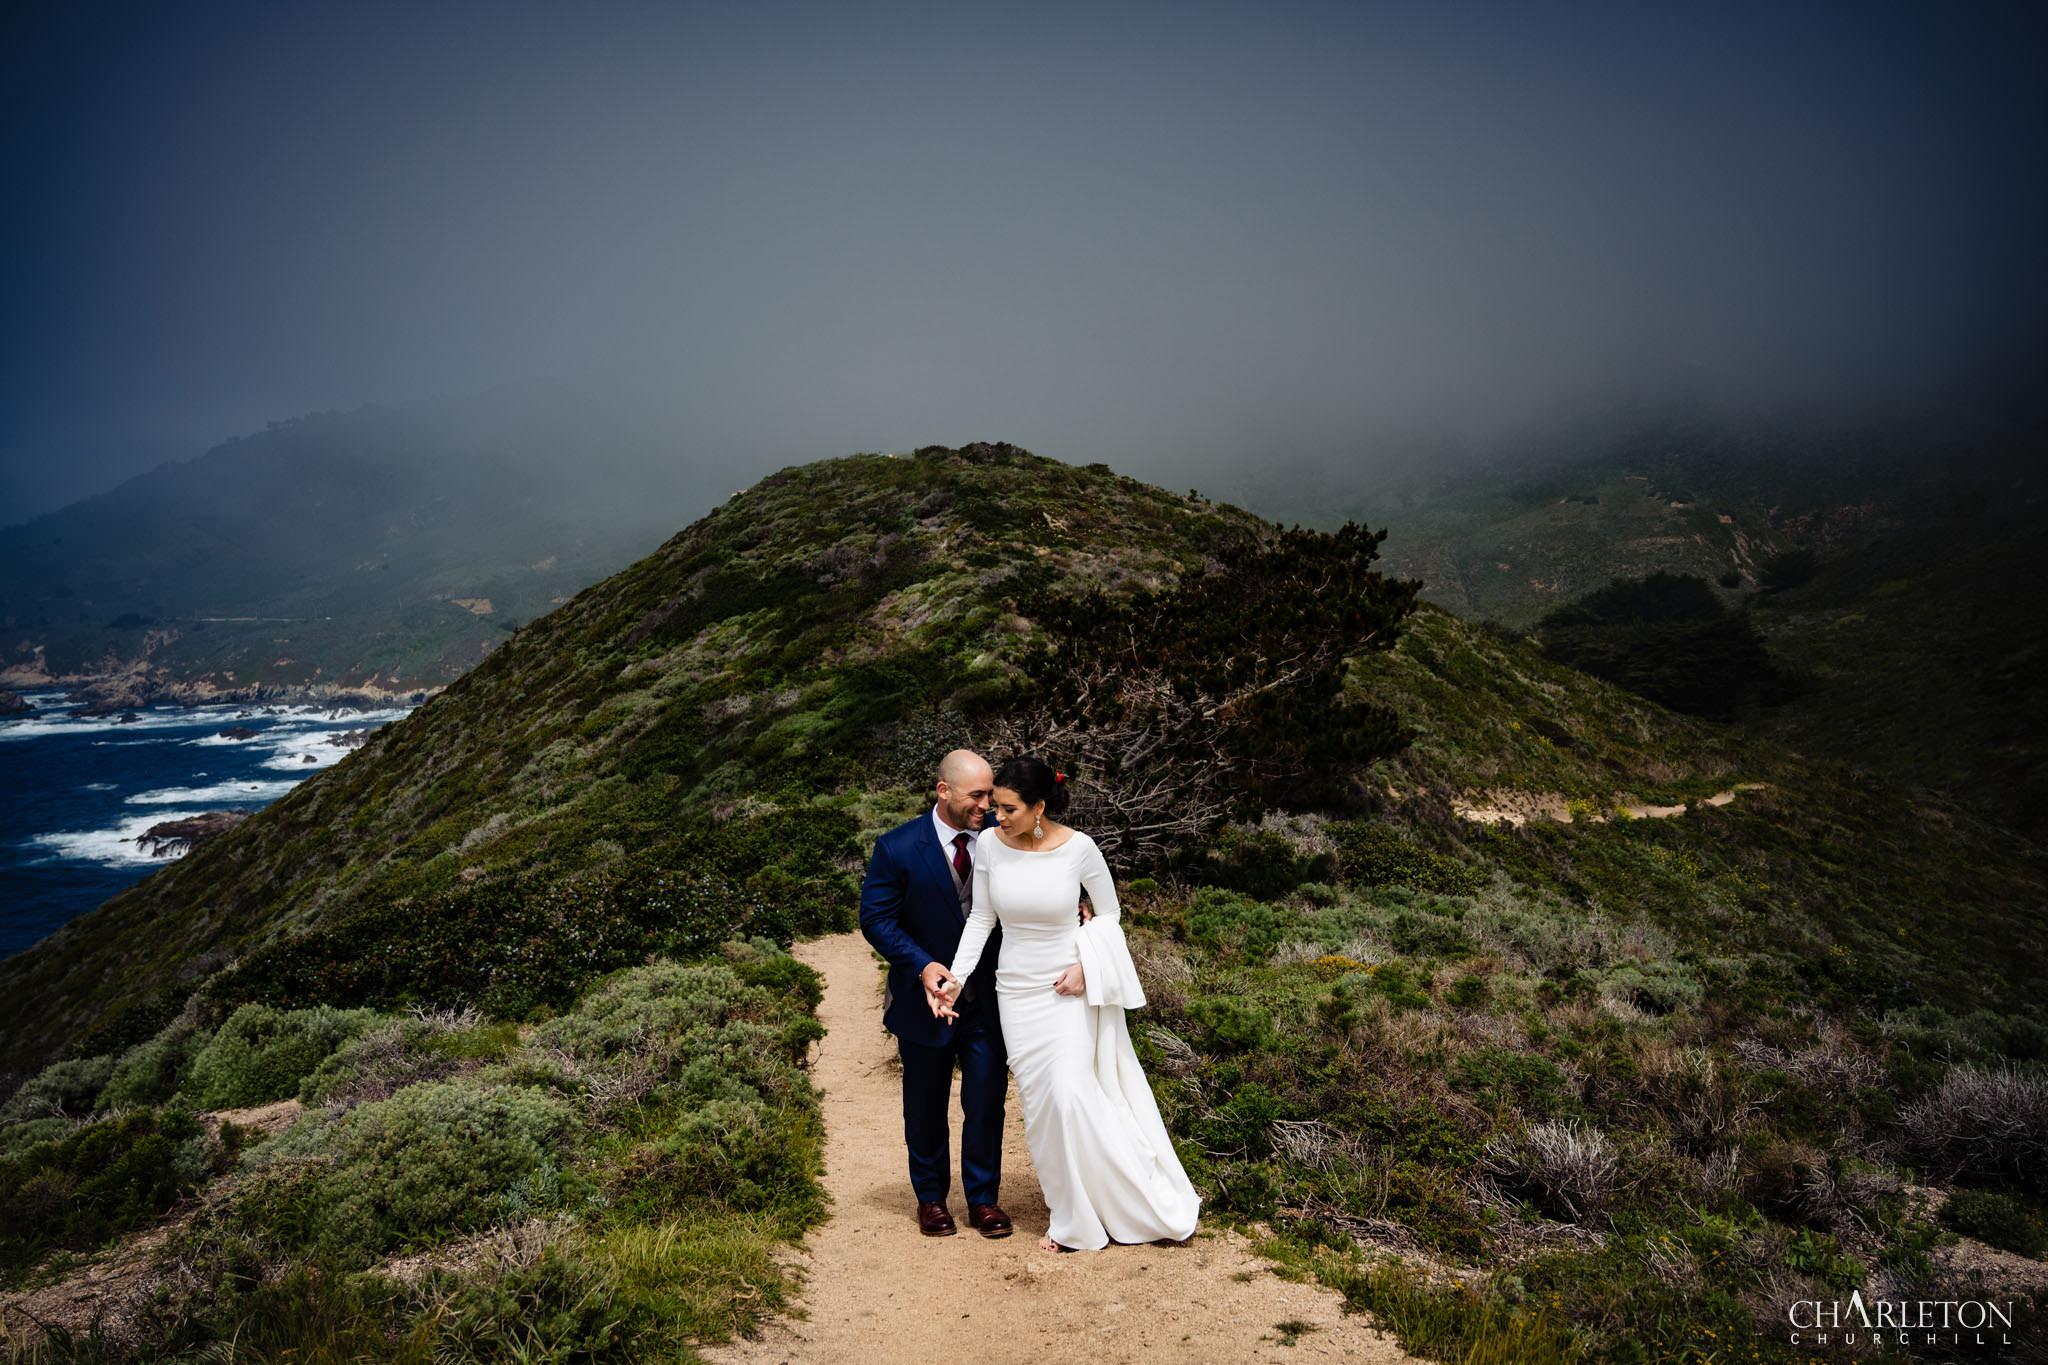 elopement couple romantic photos in big sur cliff area along the beach